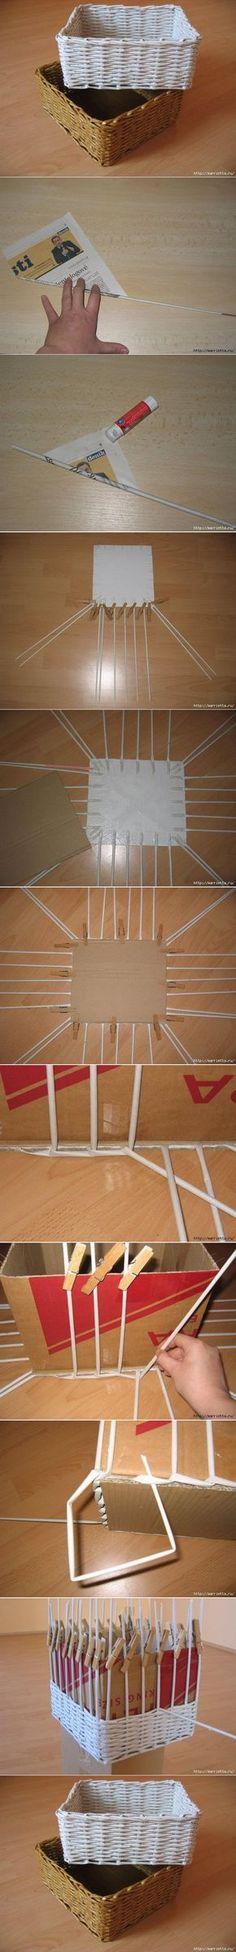 DIY Simple Newspaper Weave Basket - students could create their own too.